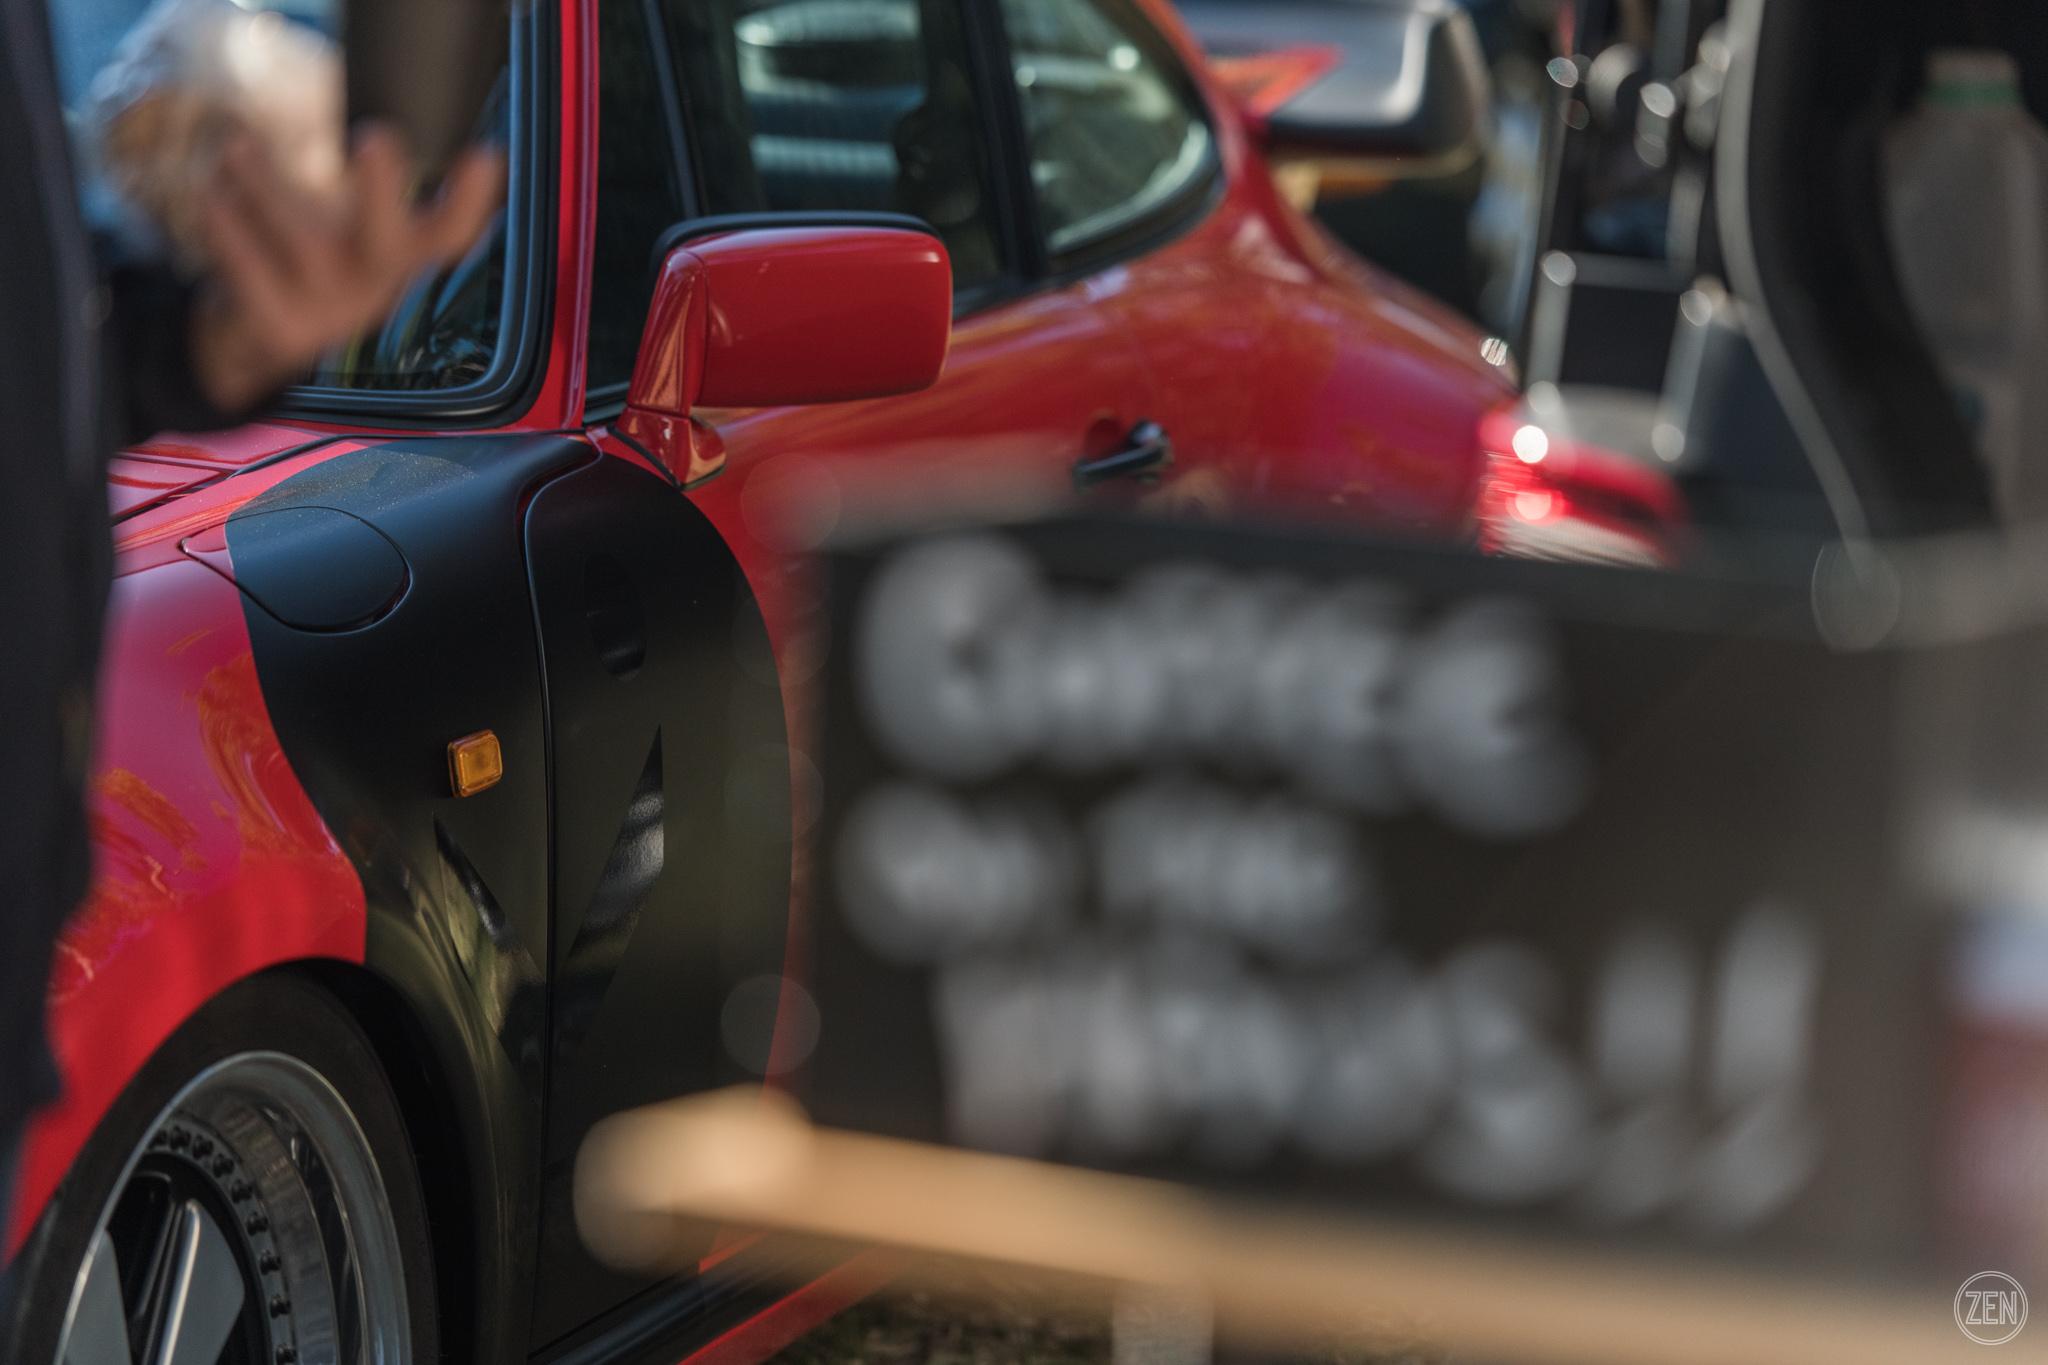 2019-07-21 - Autohaus Porches & Coffee 176